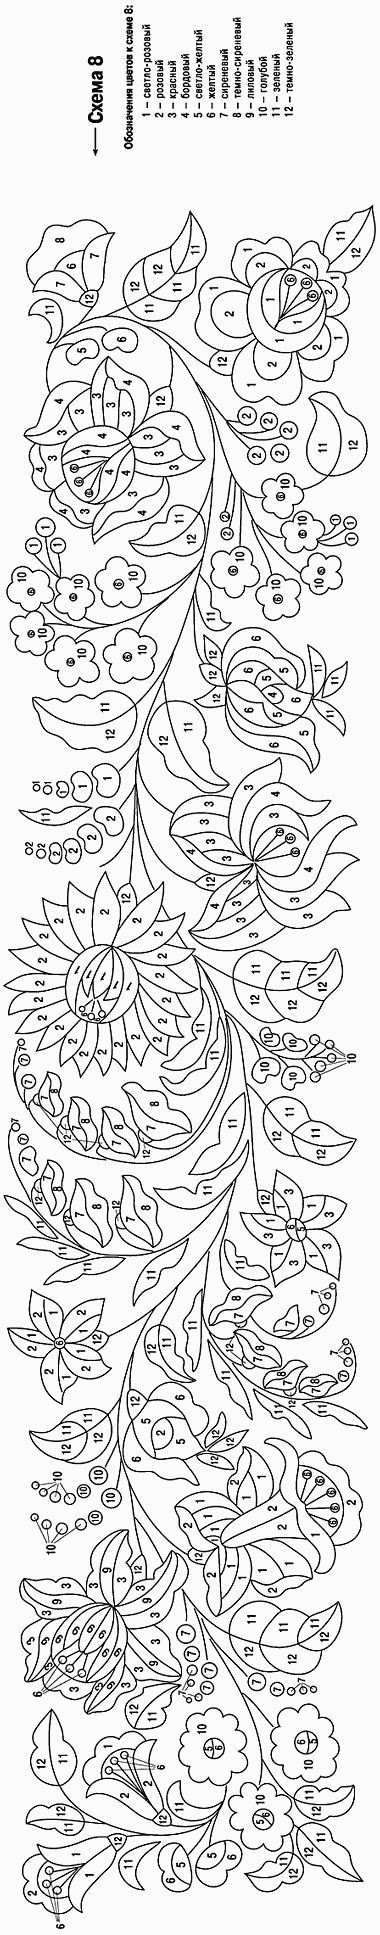 Nati Zubeldia: Bordado Mexicano! | dibujos para bordar